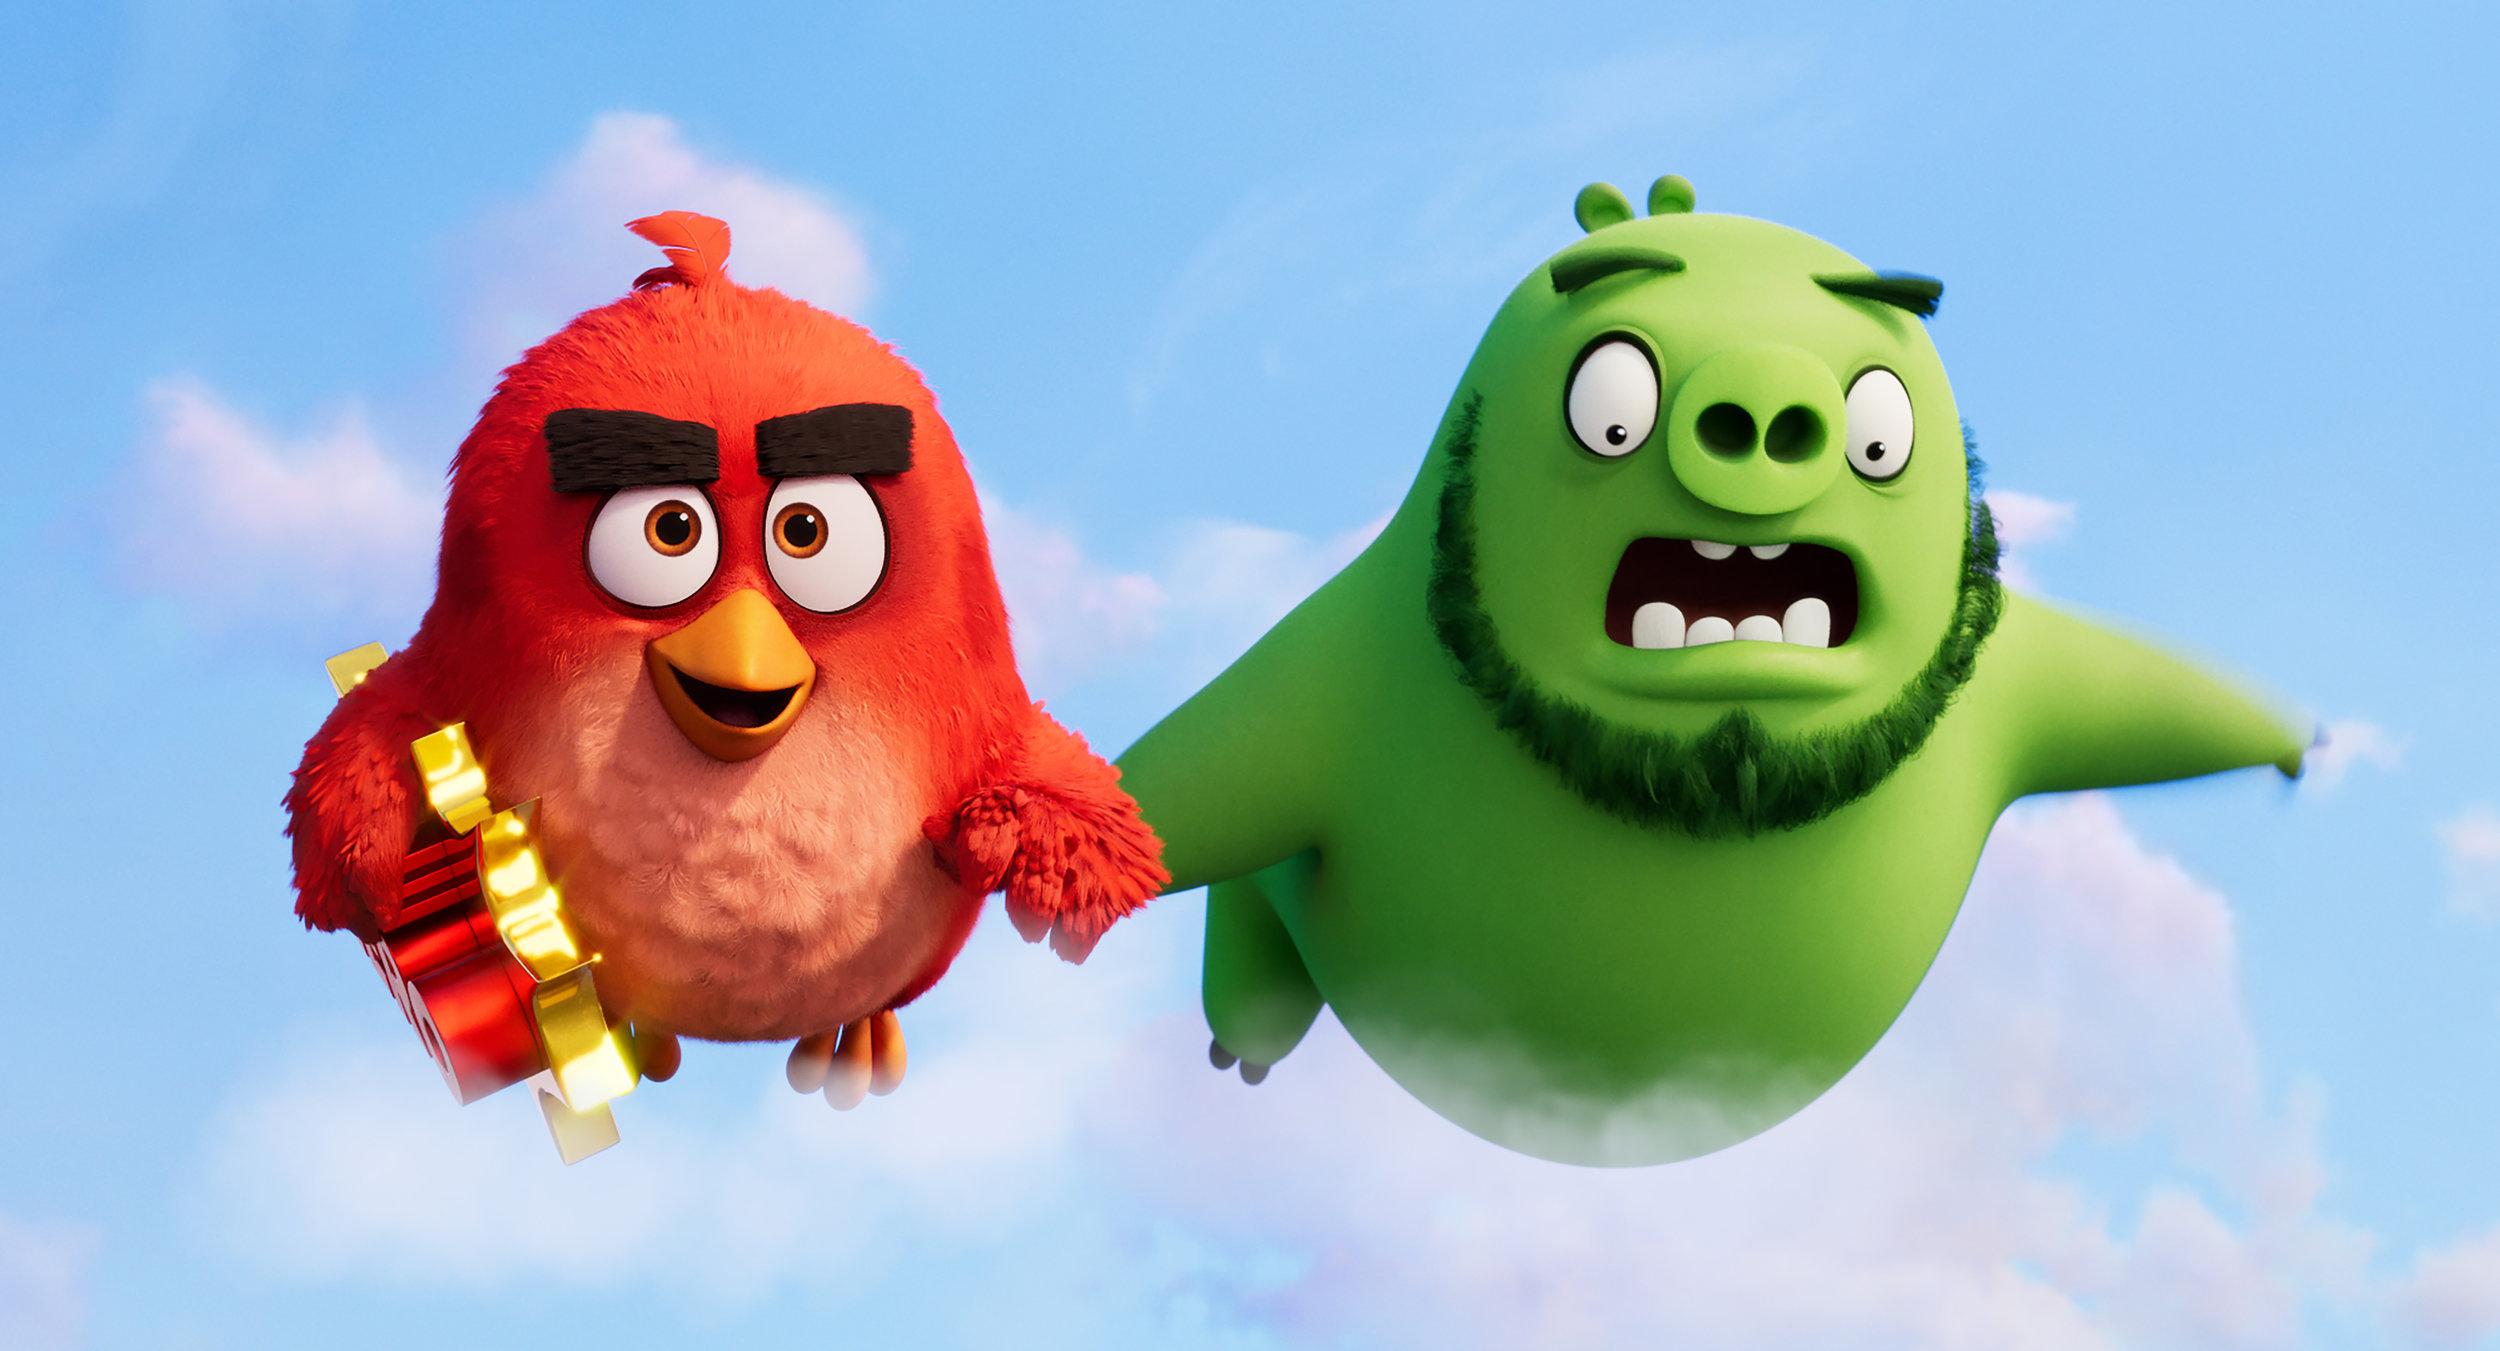 angry-birds-2-rct010_comp_s3d_lf_v38_client_t_2kdcf_vd16.1034_V2_rgb.jpg